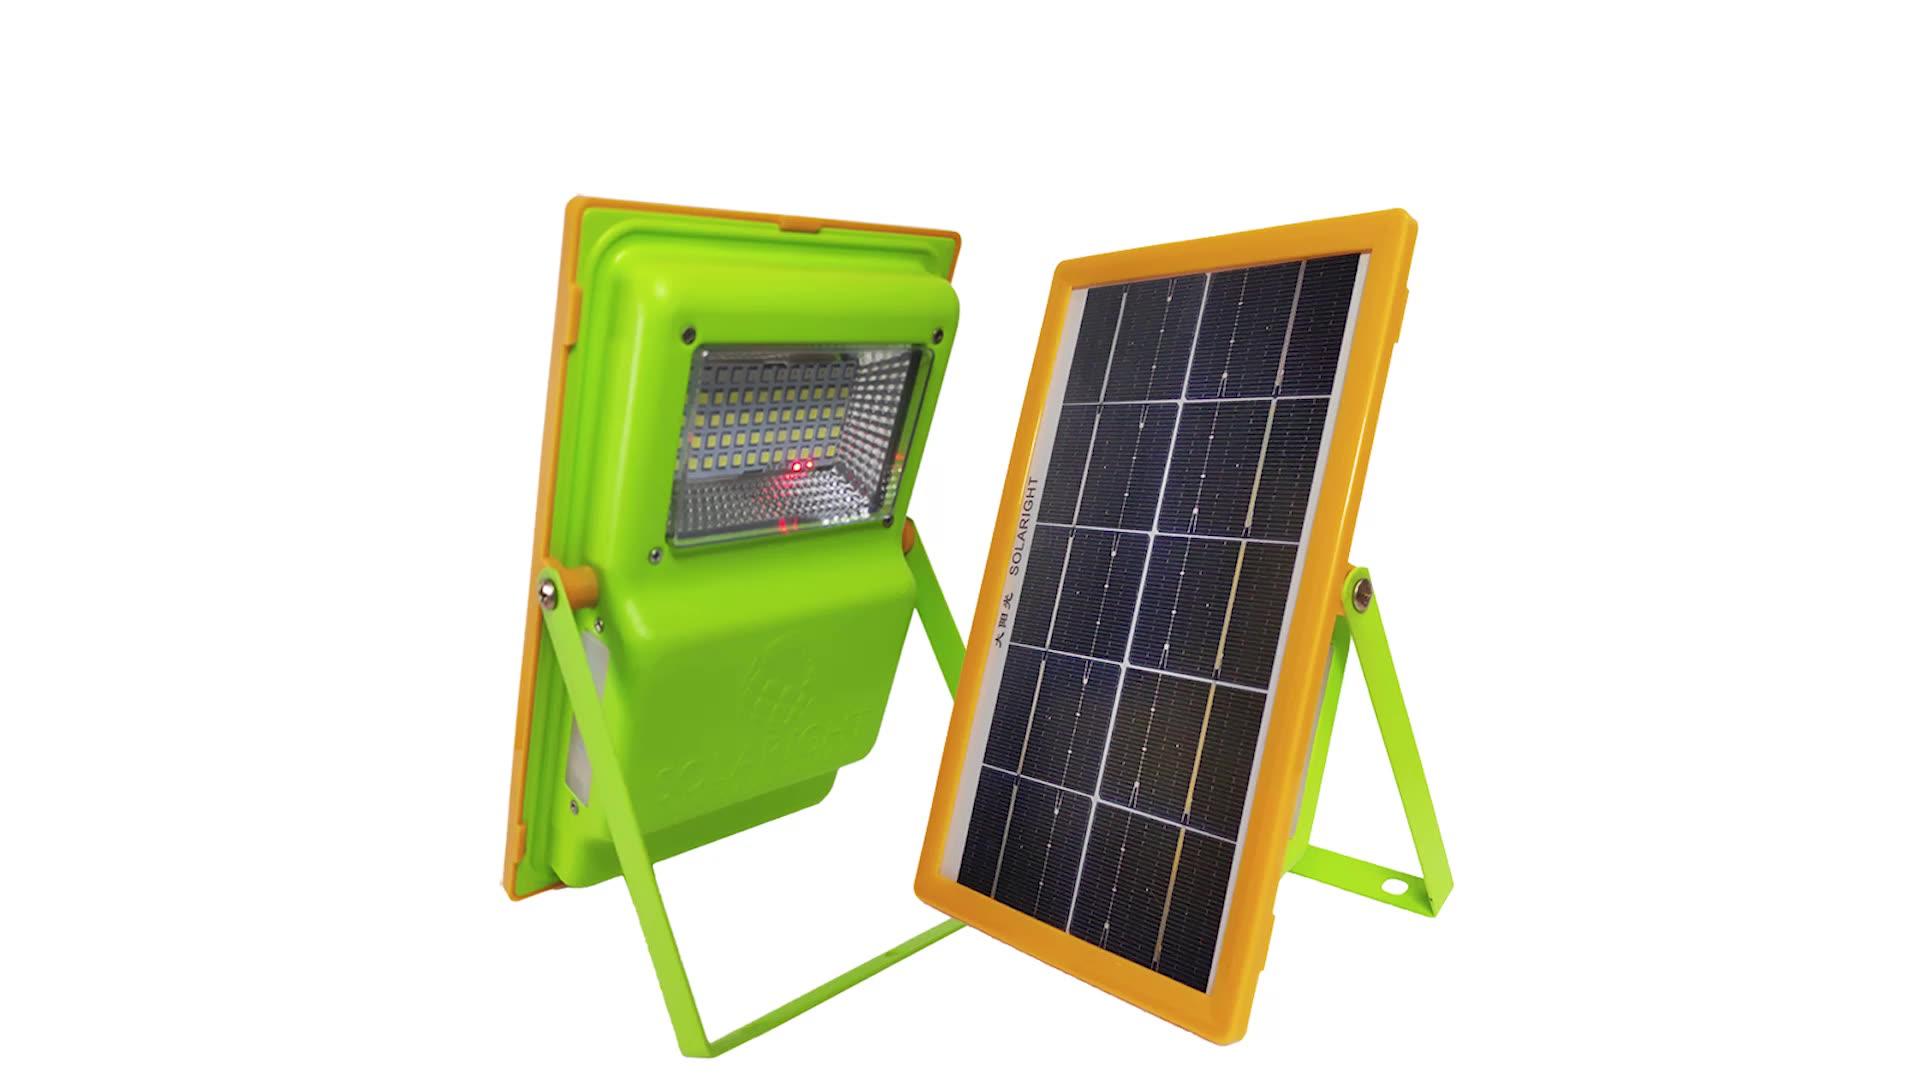 Portable charger  5v 6w mono crystalline panel 10000mah power bank solar camping light